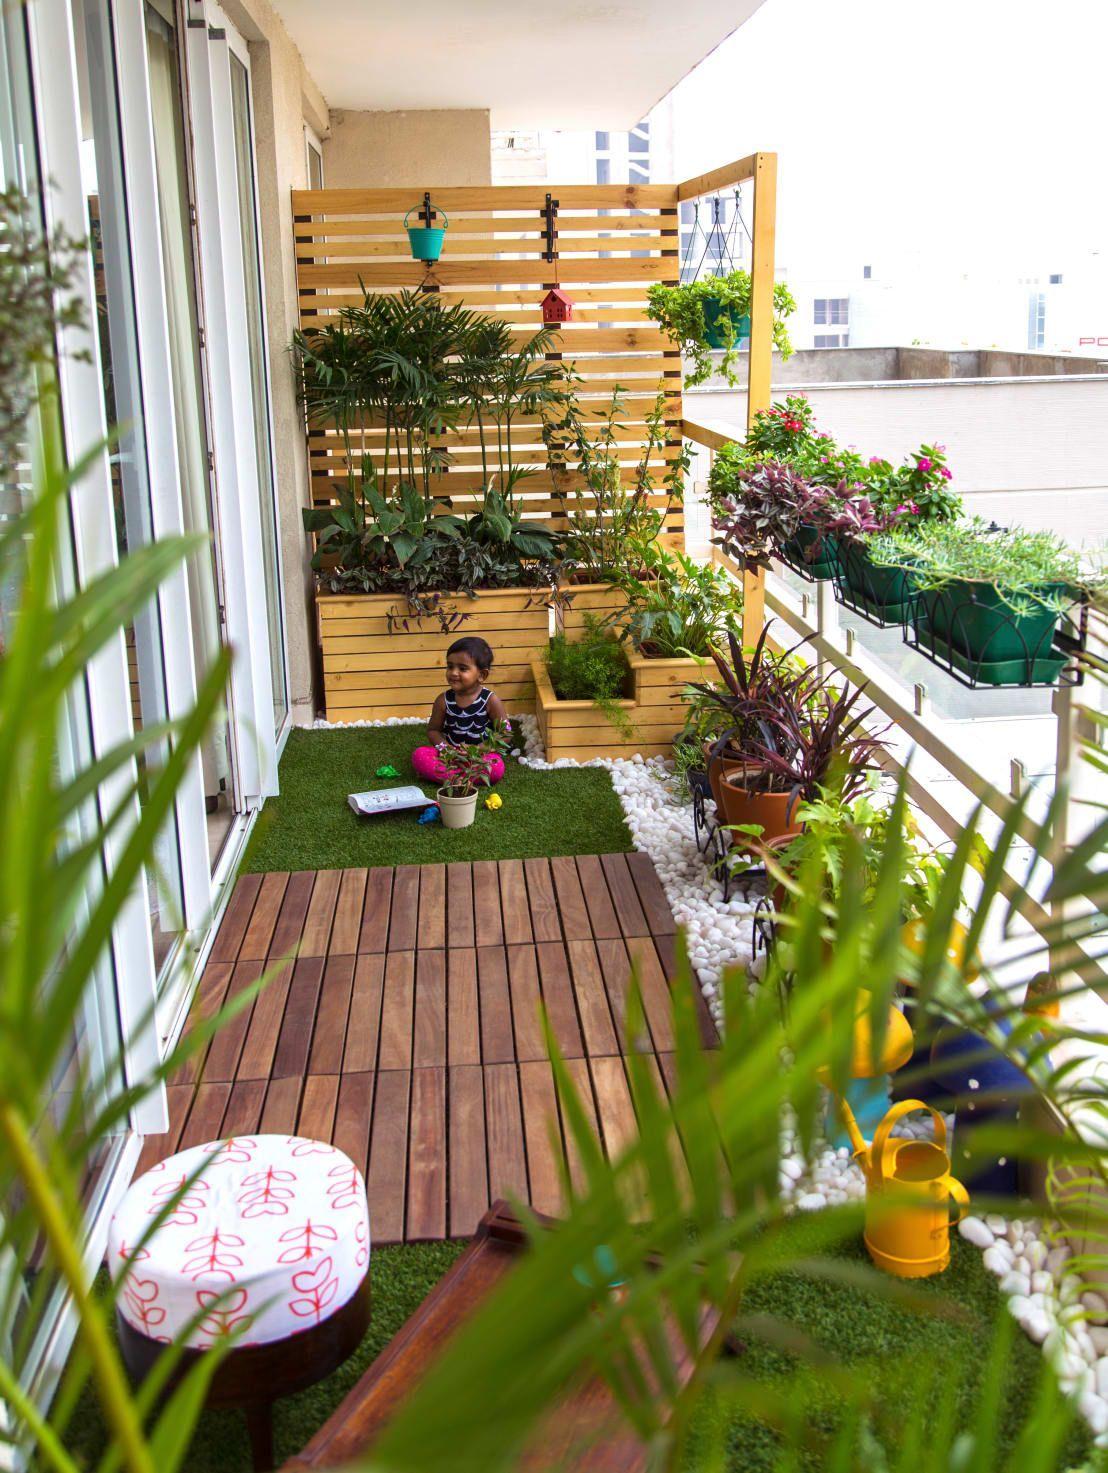 15 Smart Balcony Garden Ideas That are